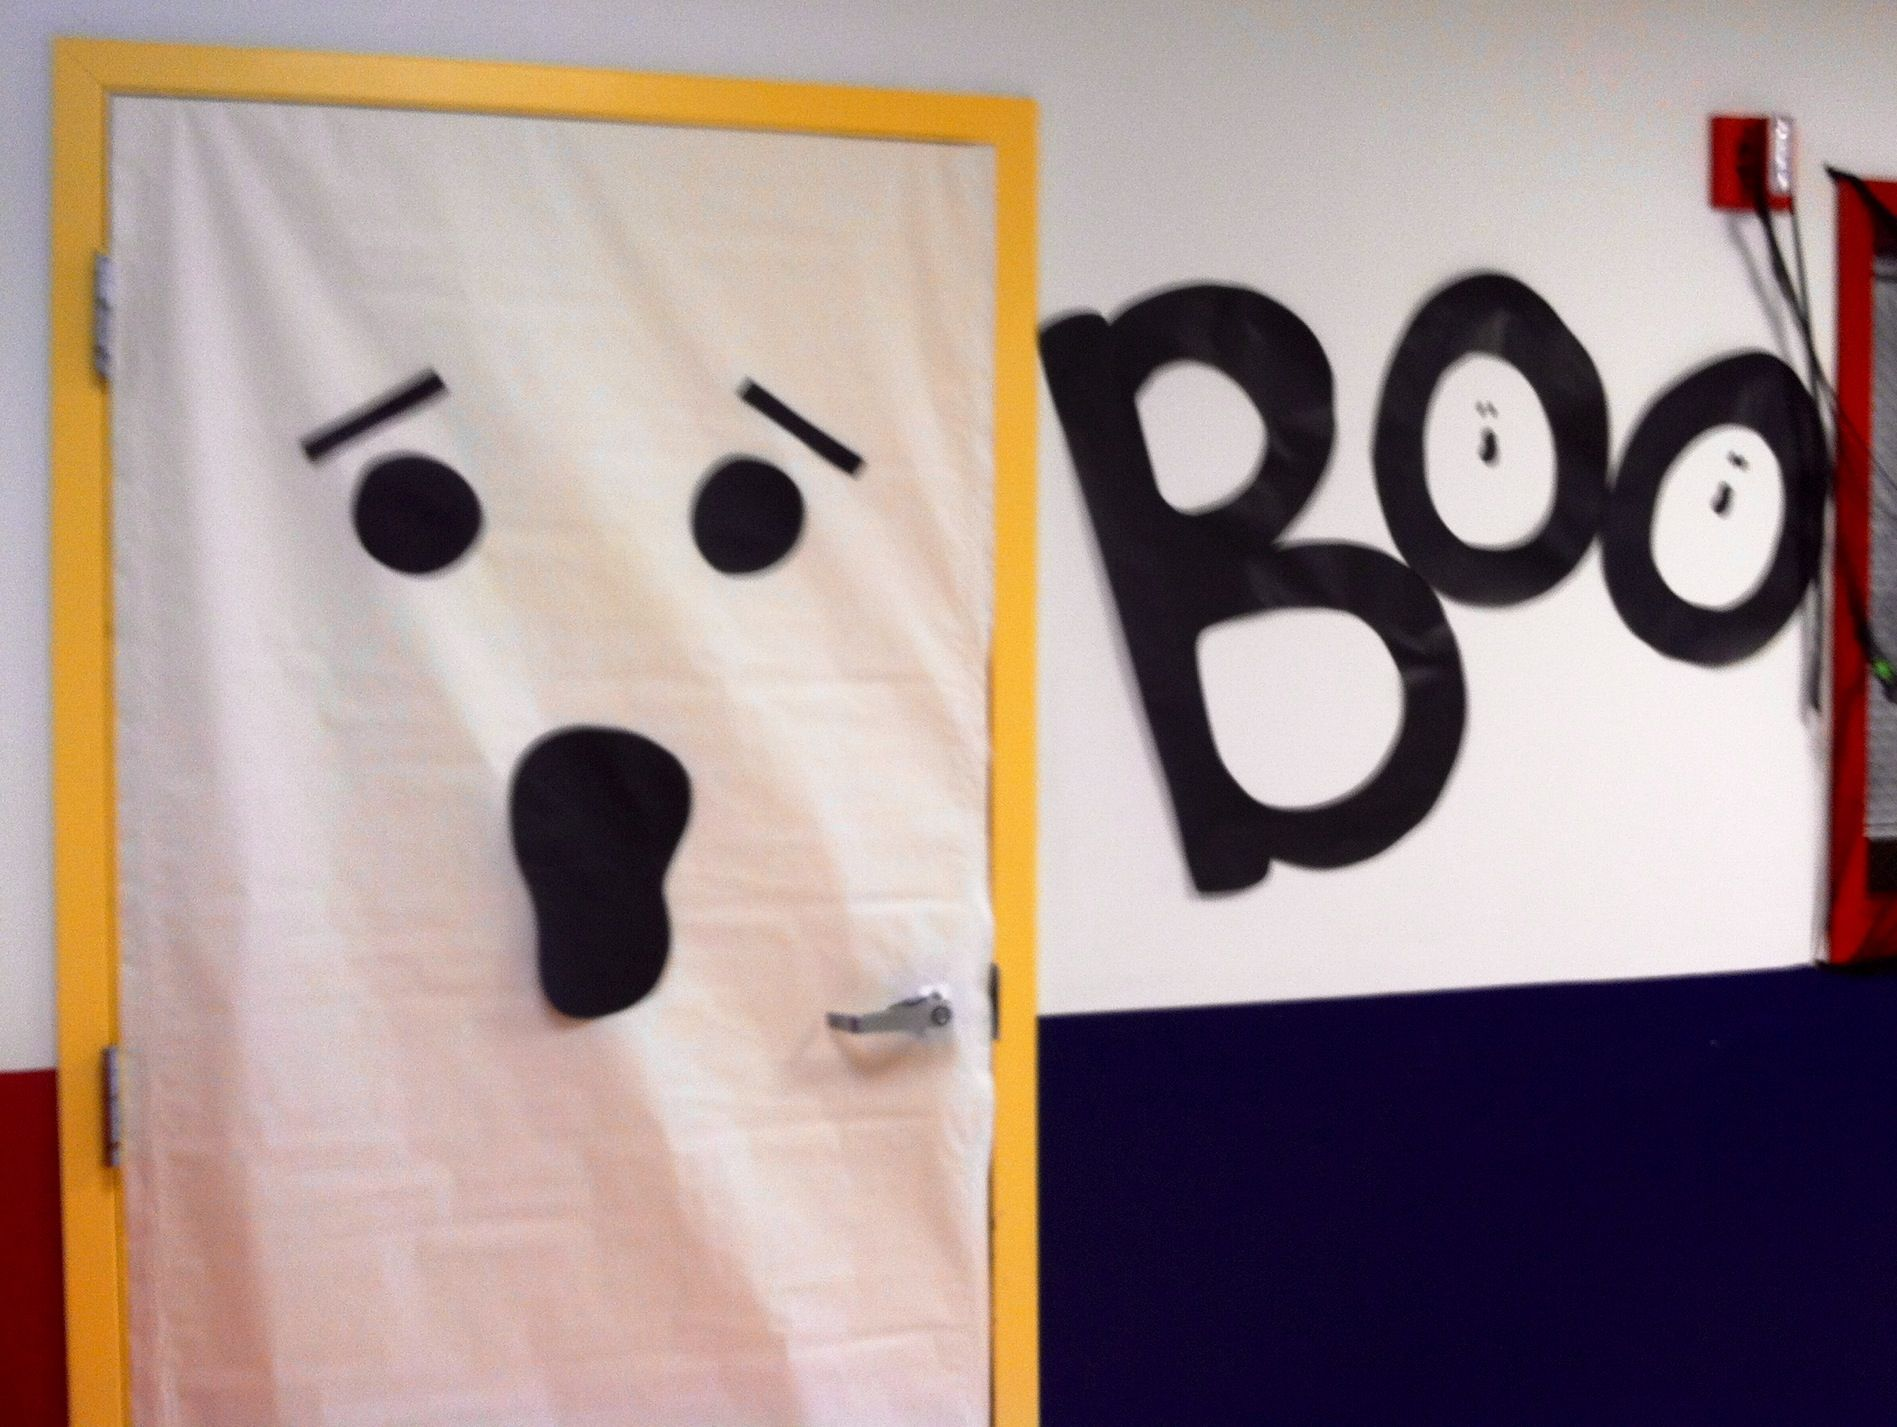 Ghost door at school & Ghost door at school   School Art Projects   Pinterest   School art ...